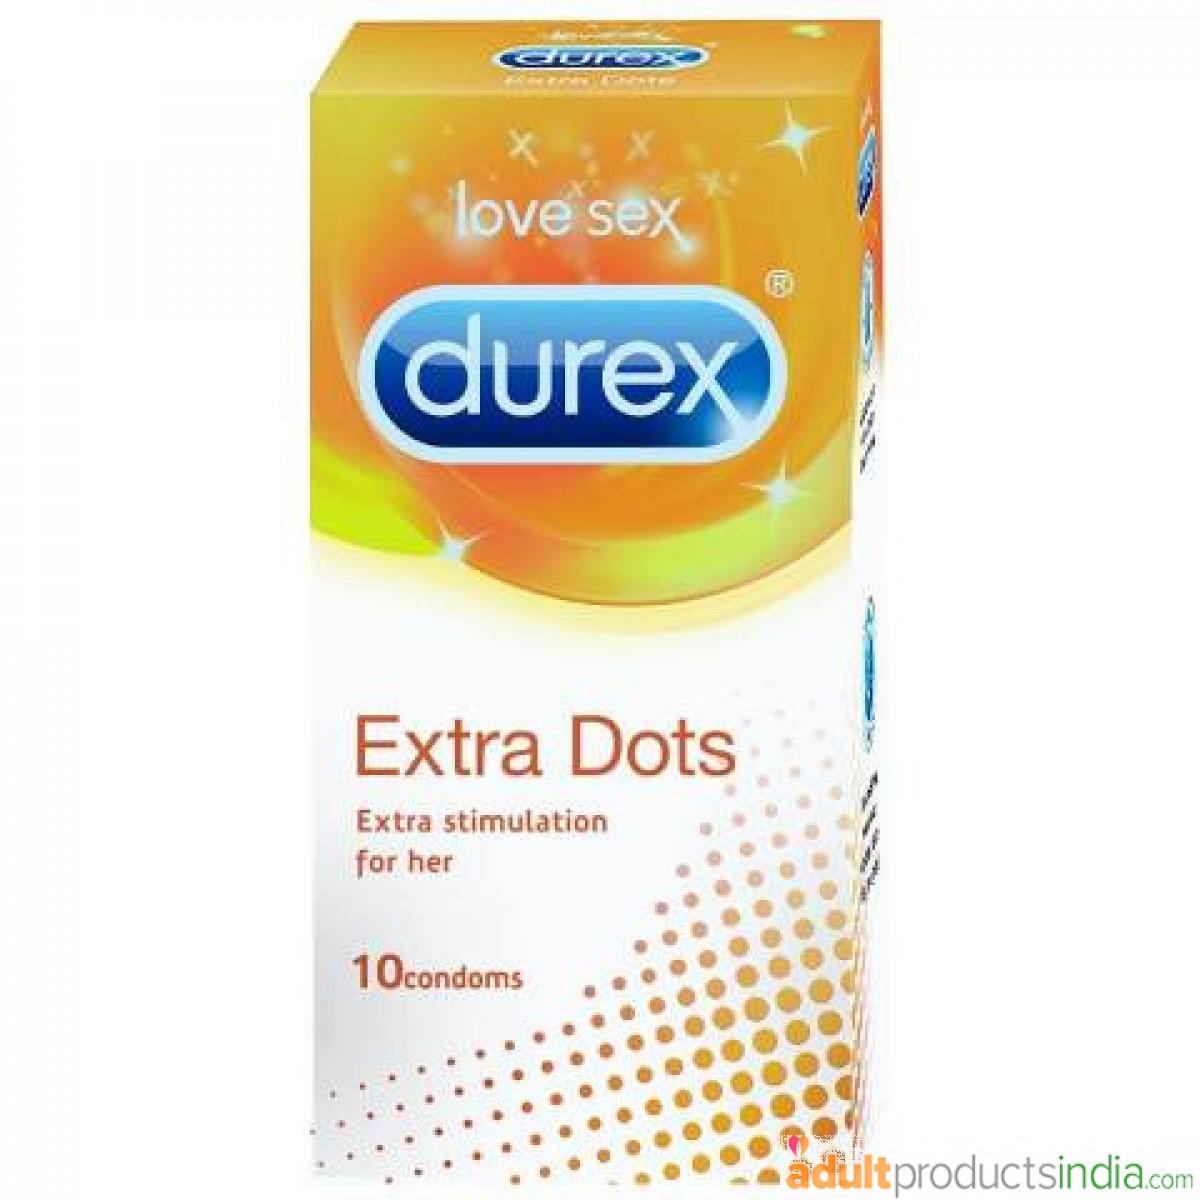 Durex - Extra Dots - 10 pieces